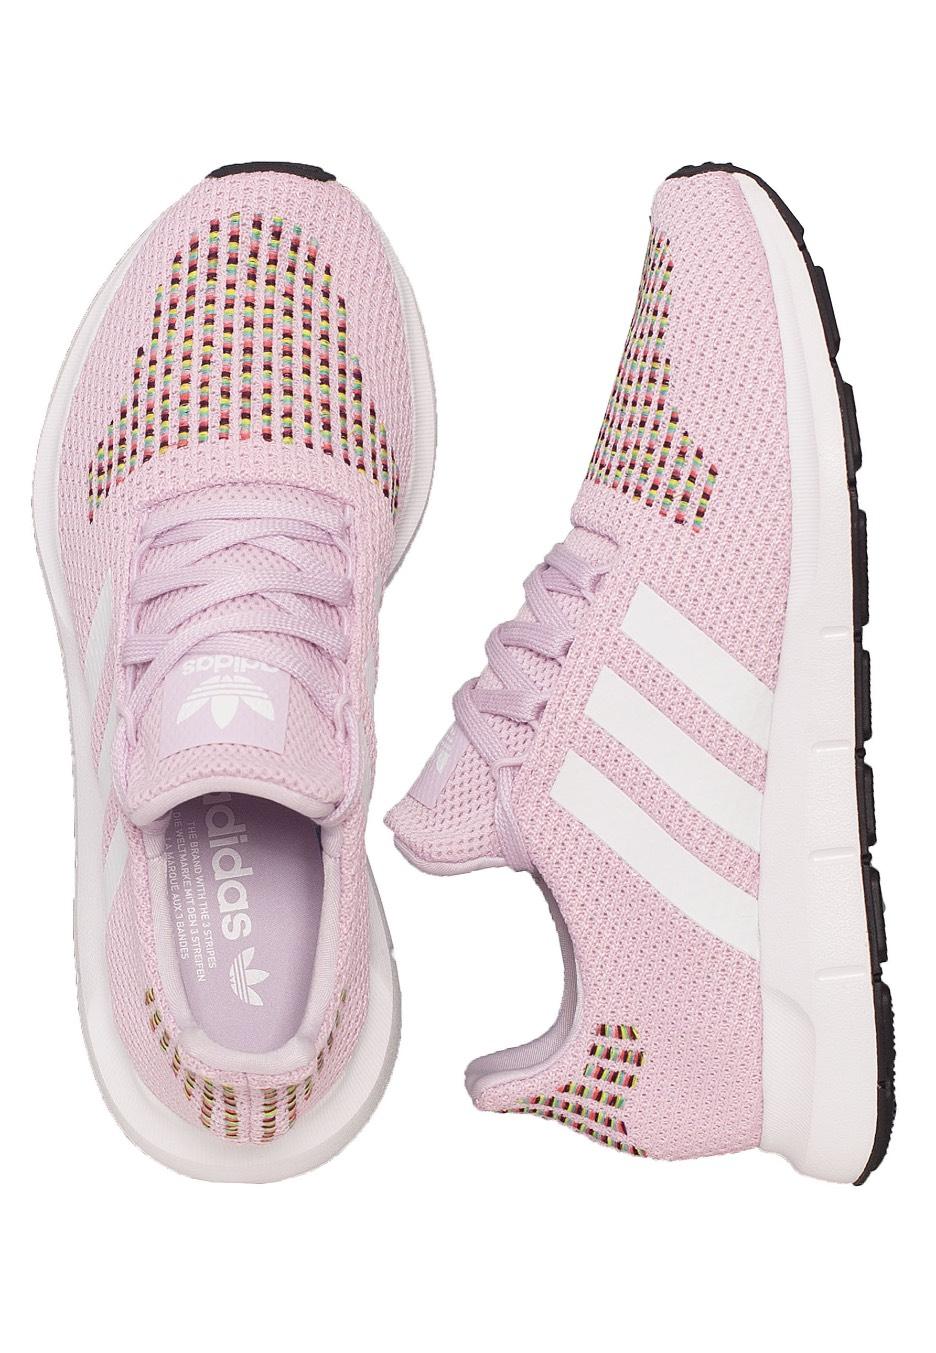 12b15a87f Adidas - Swift Run Aero Pink Ftw White Core Black - Girl Shoes -  Impericon.com US